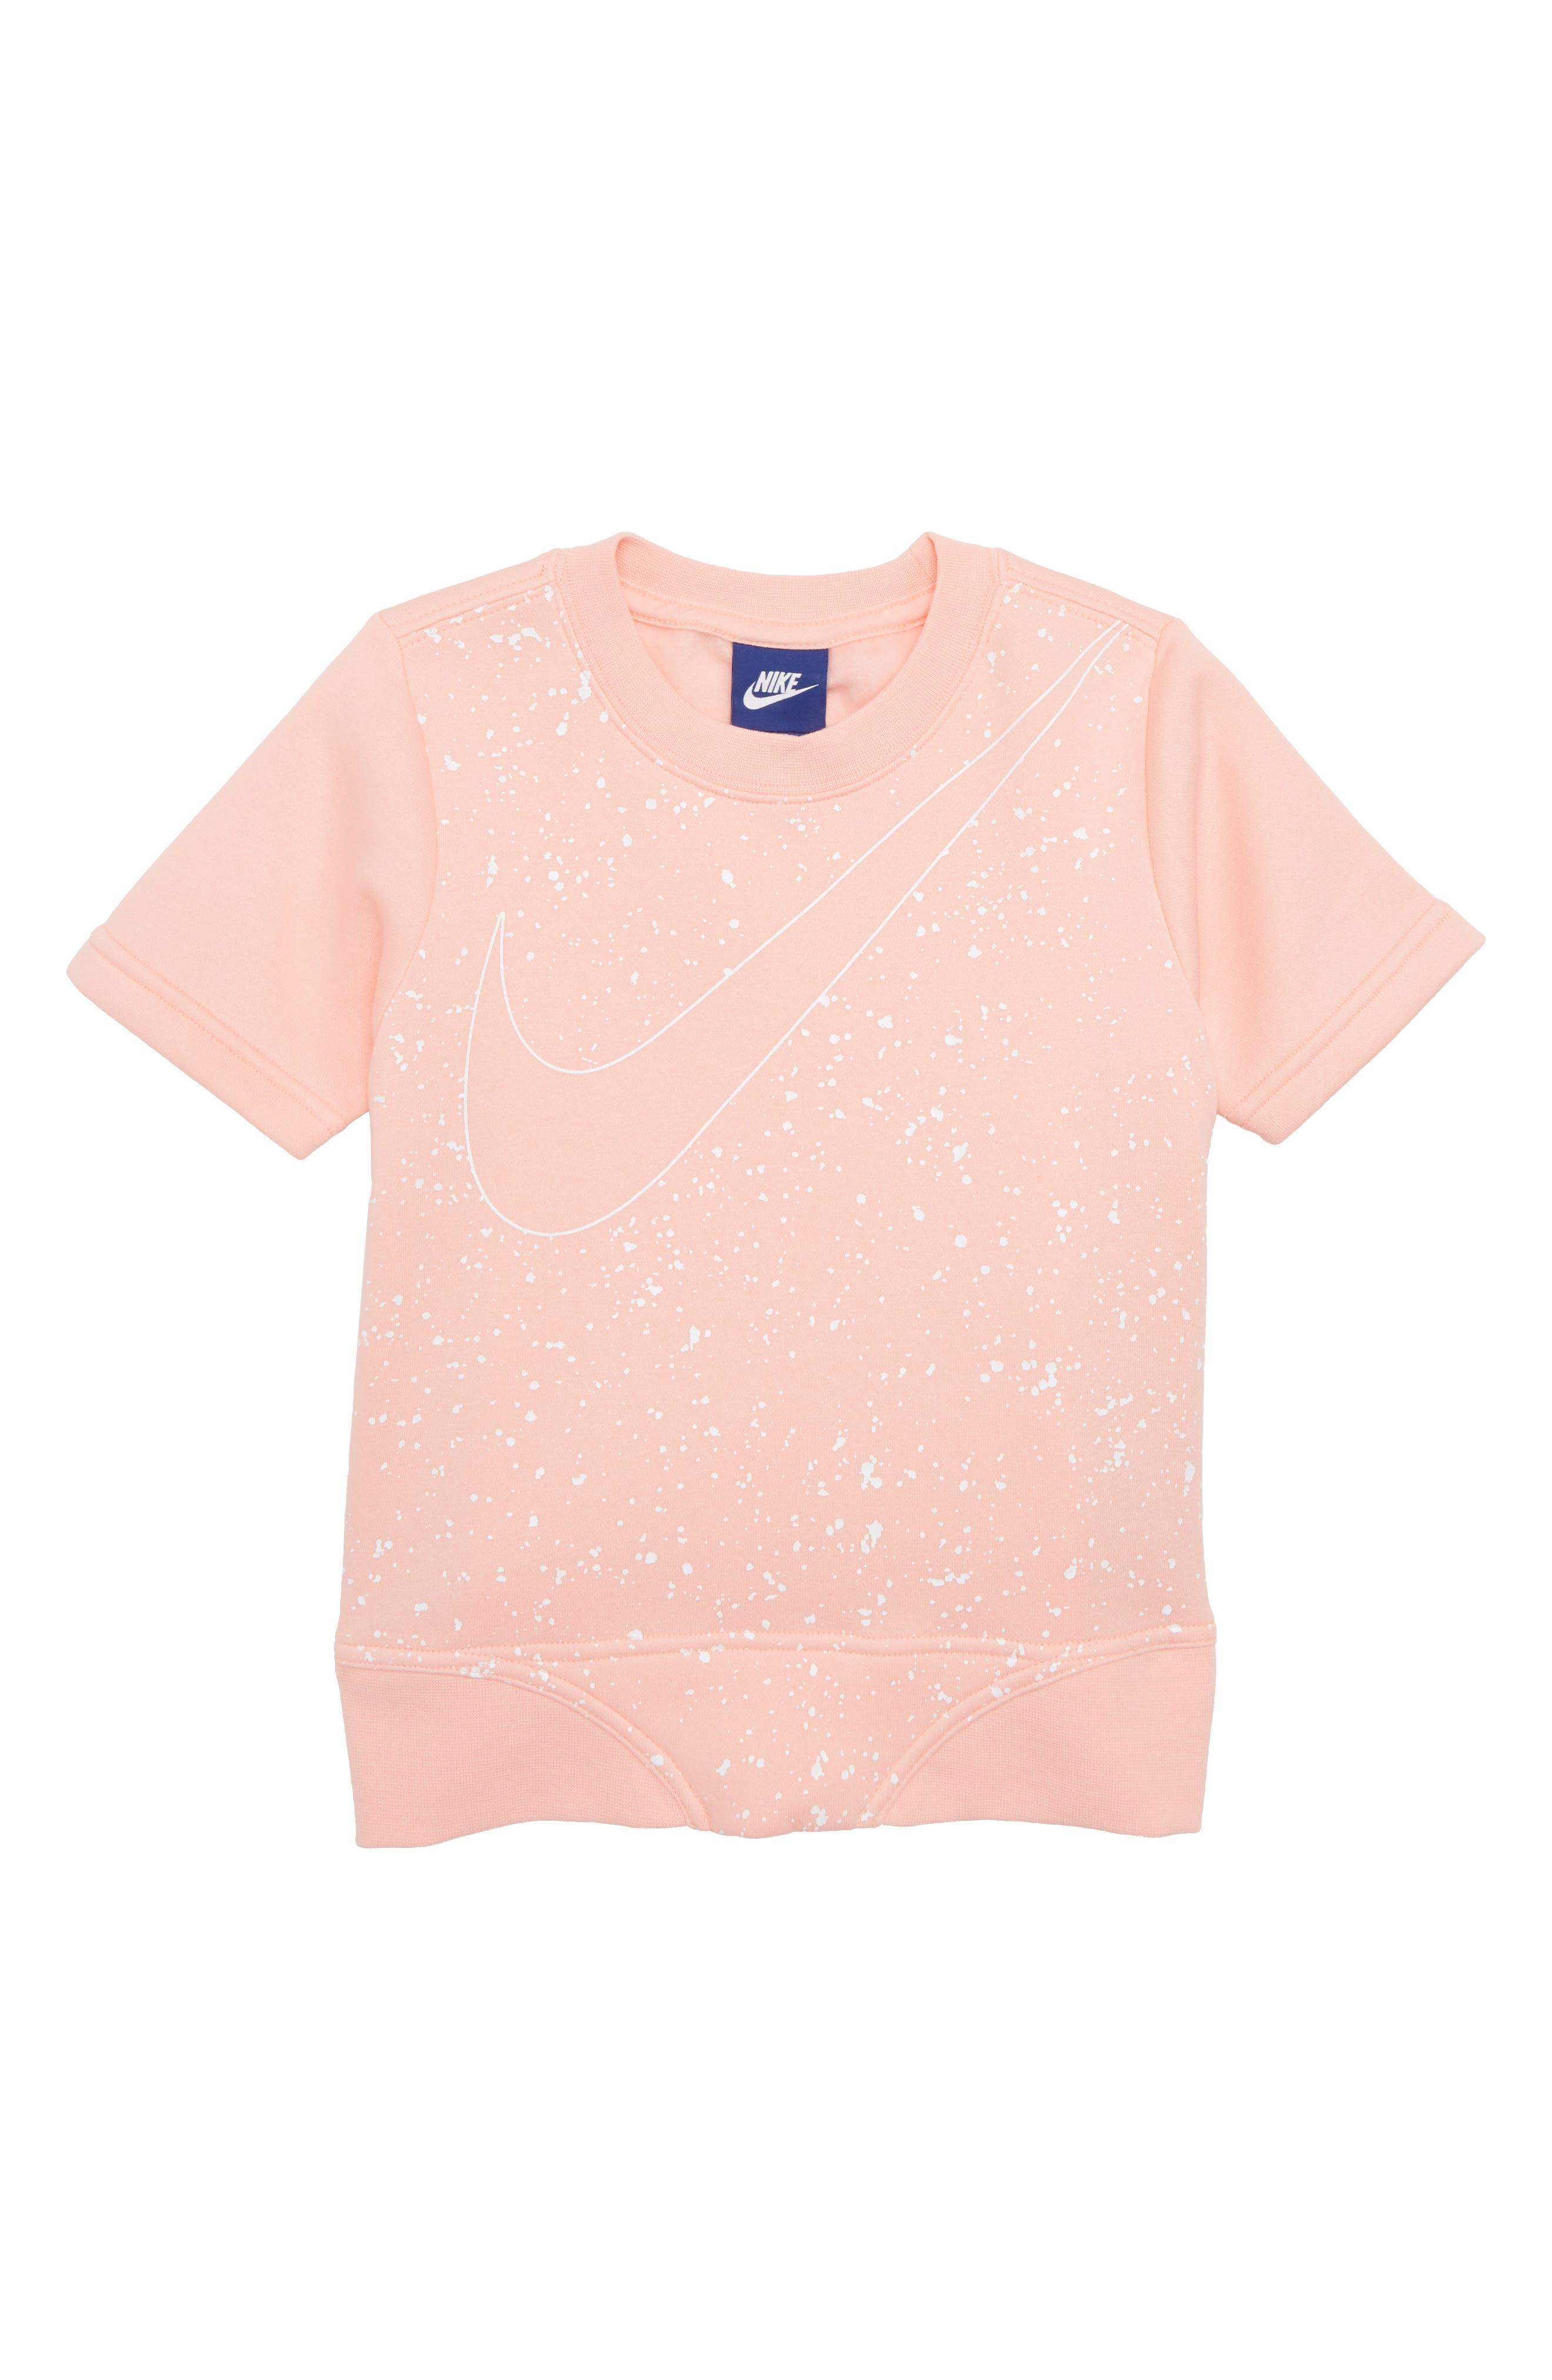 Sportswear Short Sleeve Sweatshirt,                             Main thumbnail 1, color,                             Bleached Coral/ White